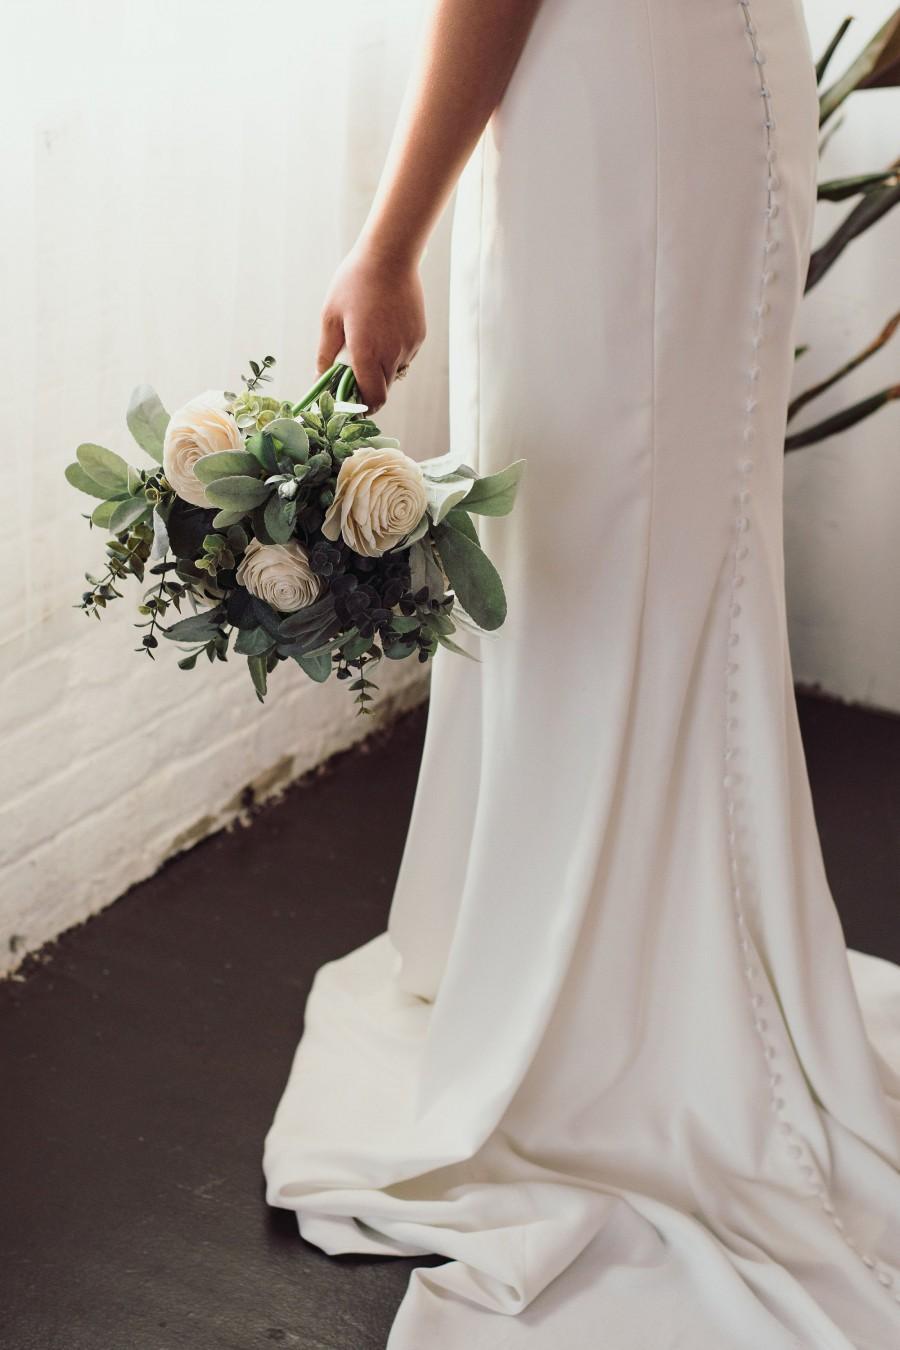 Hochzeit - Greenery Bridal Bouquet, Ivory Rose Wedding Bouquet White Rose Bridal Bouquet, White Greenery Bouquet, White and Green Wedding Bouquet